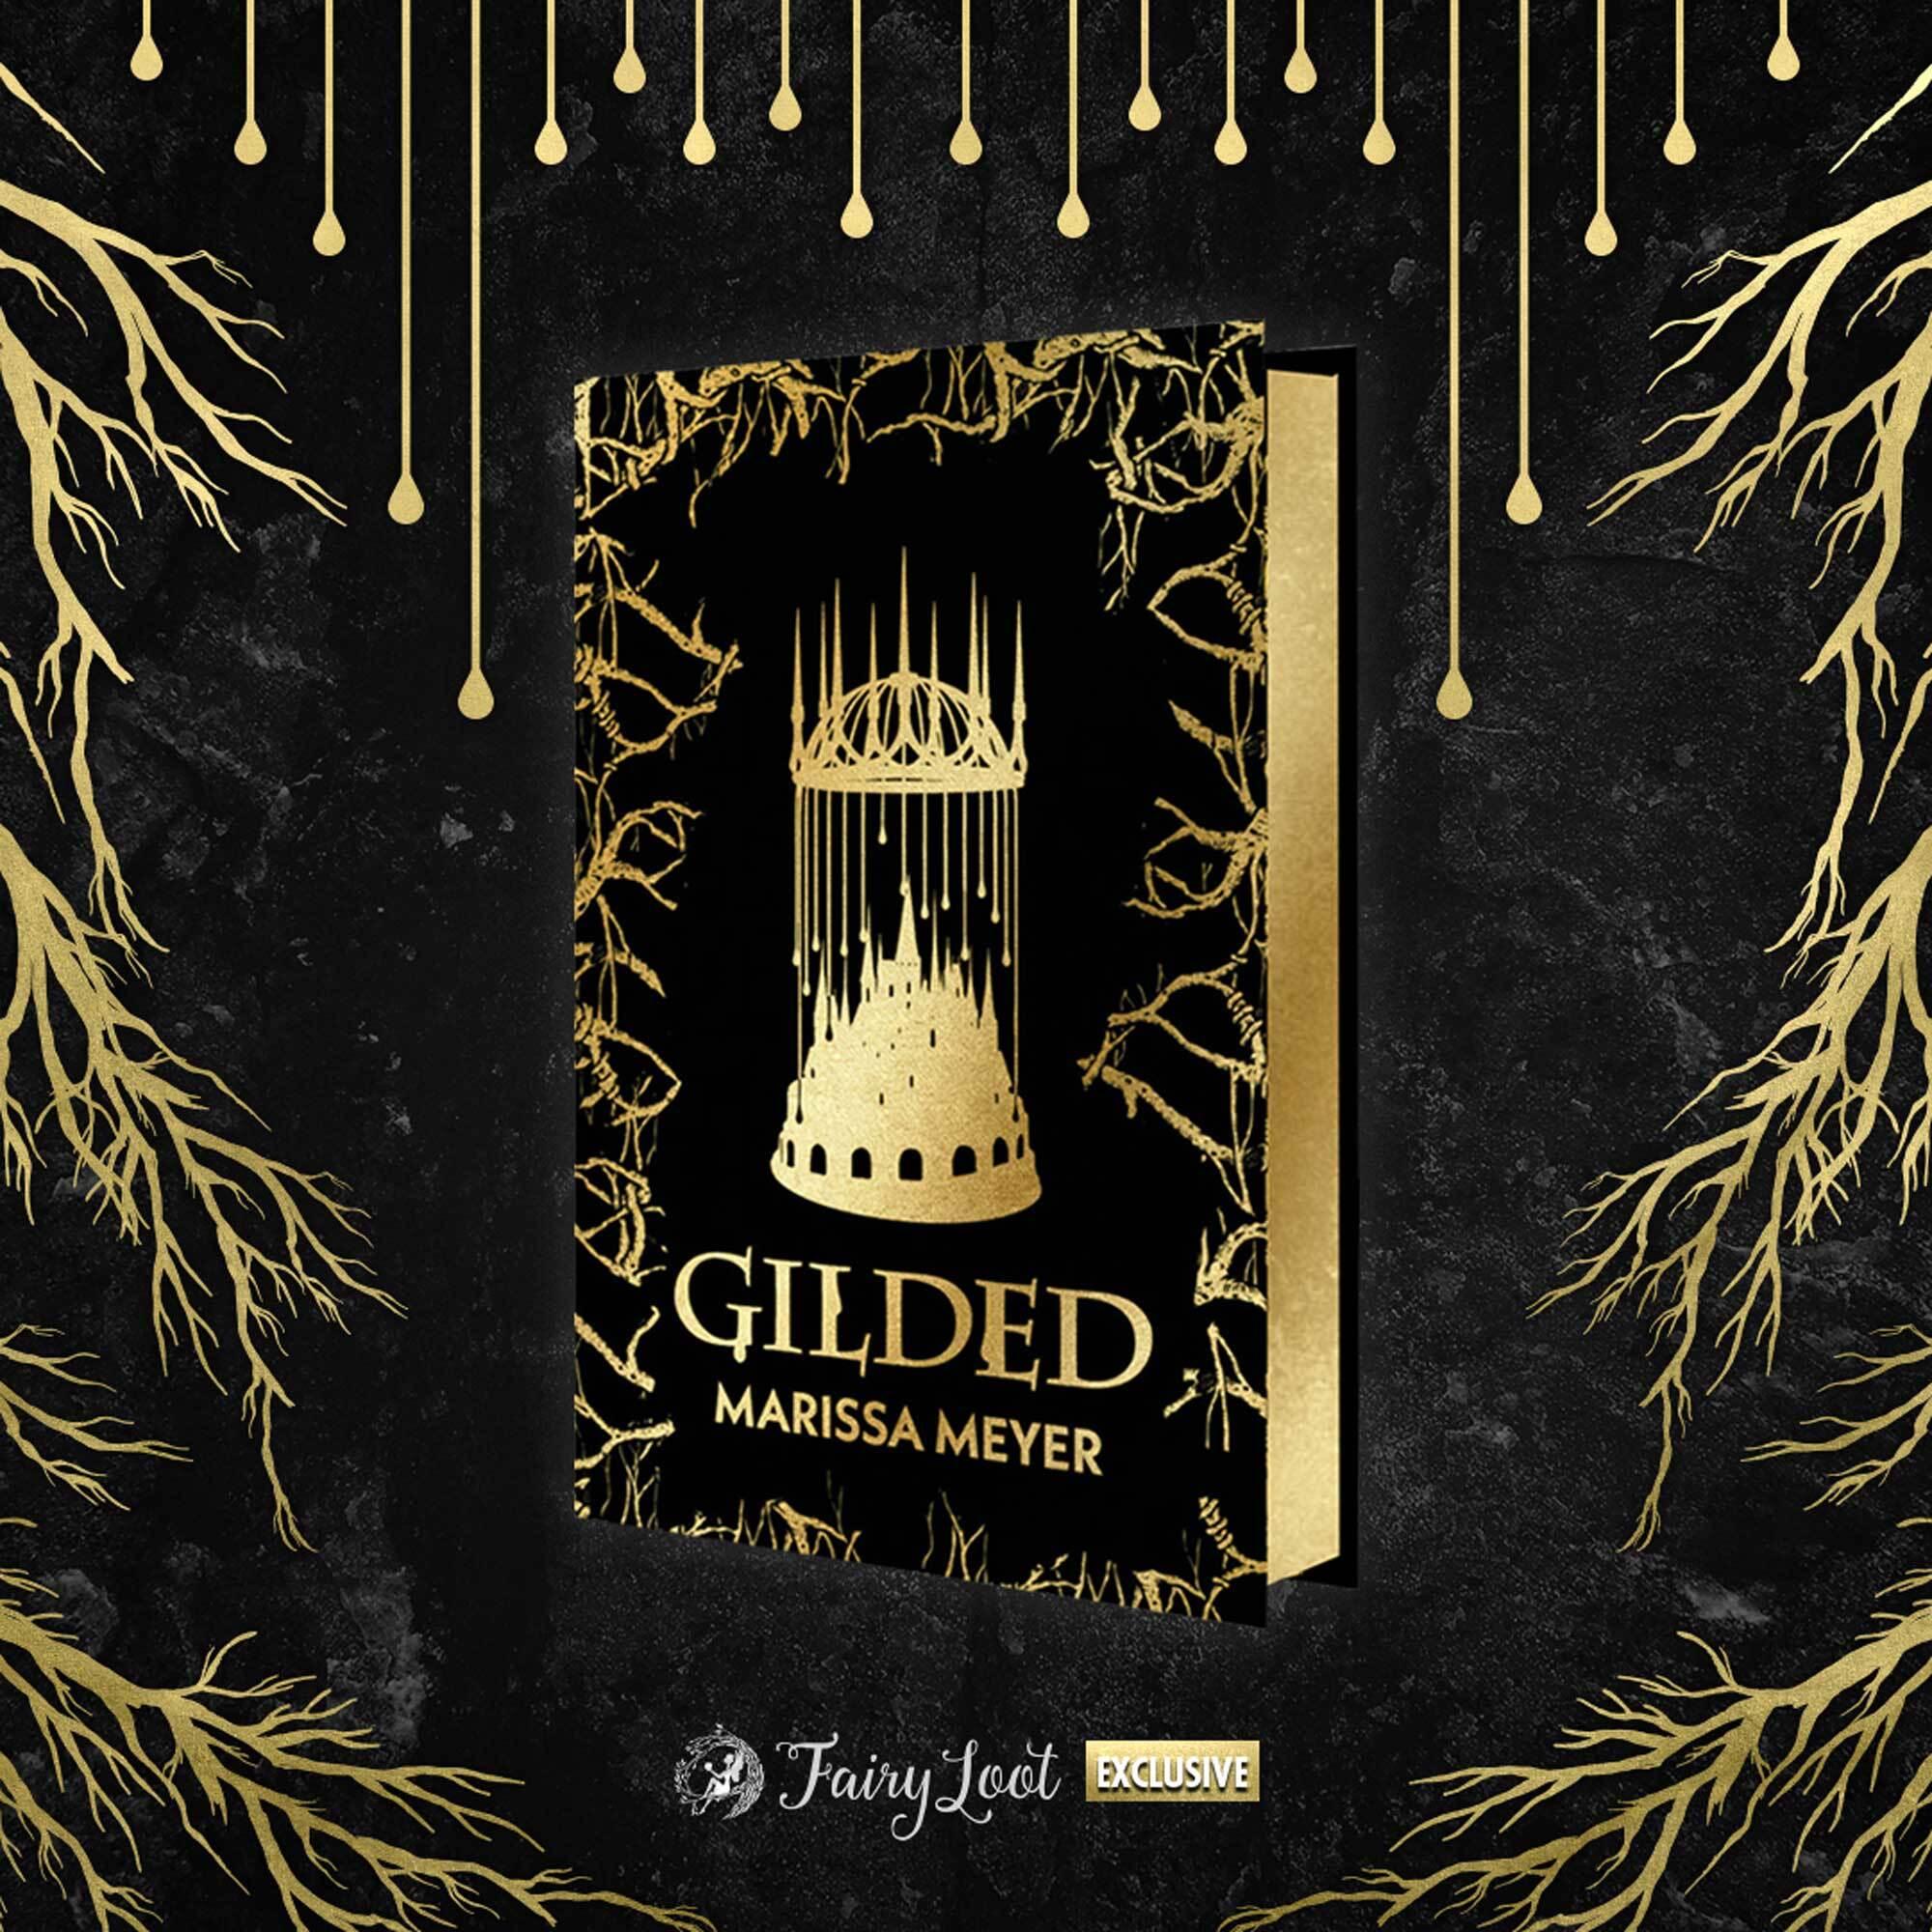 Gilded by Marissa Meyer